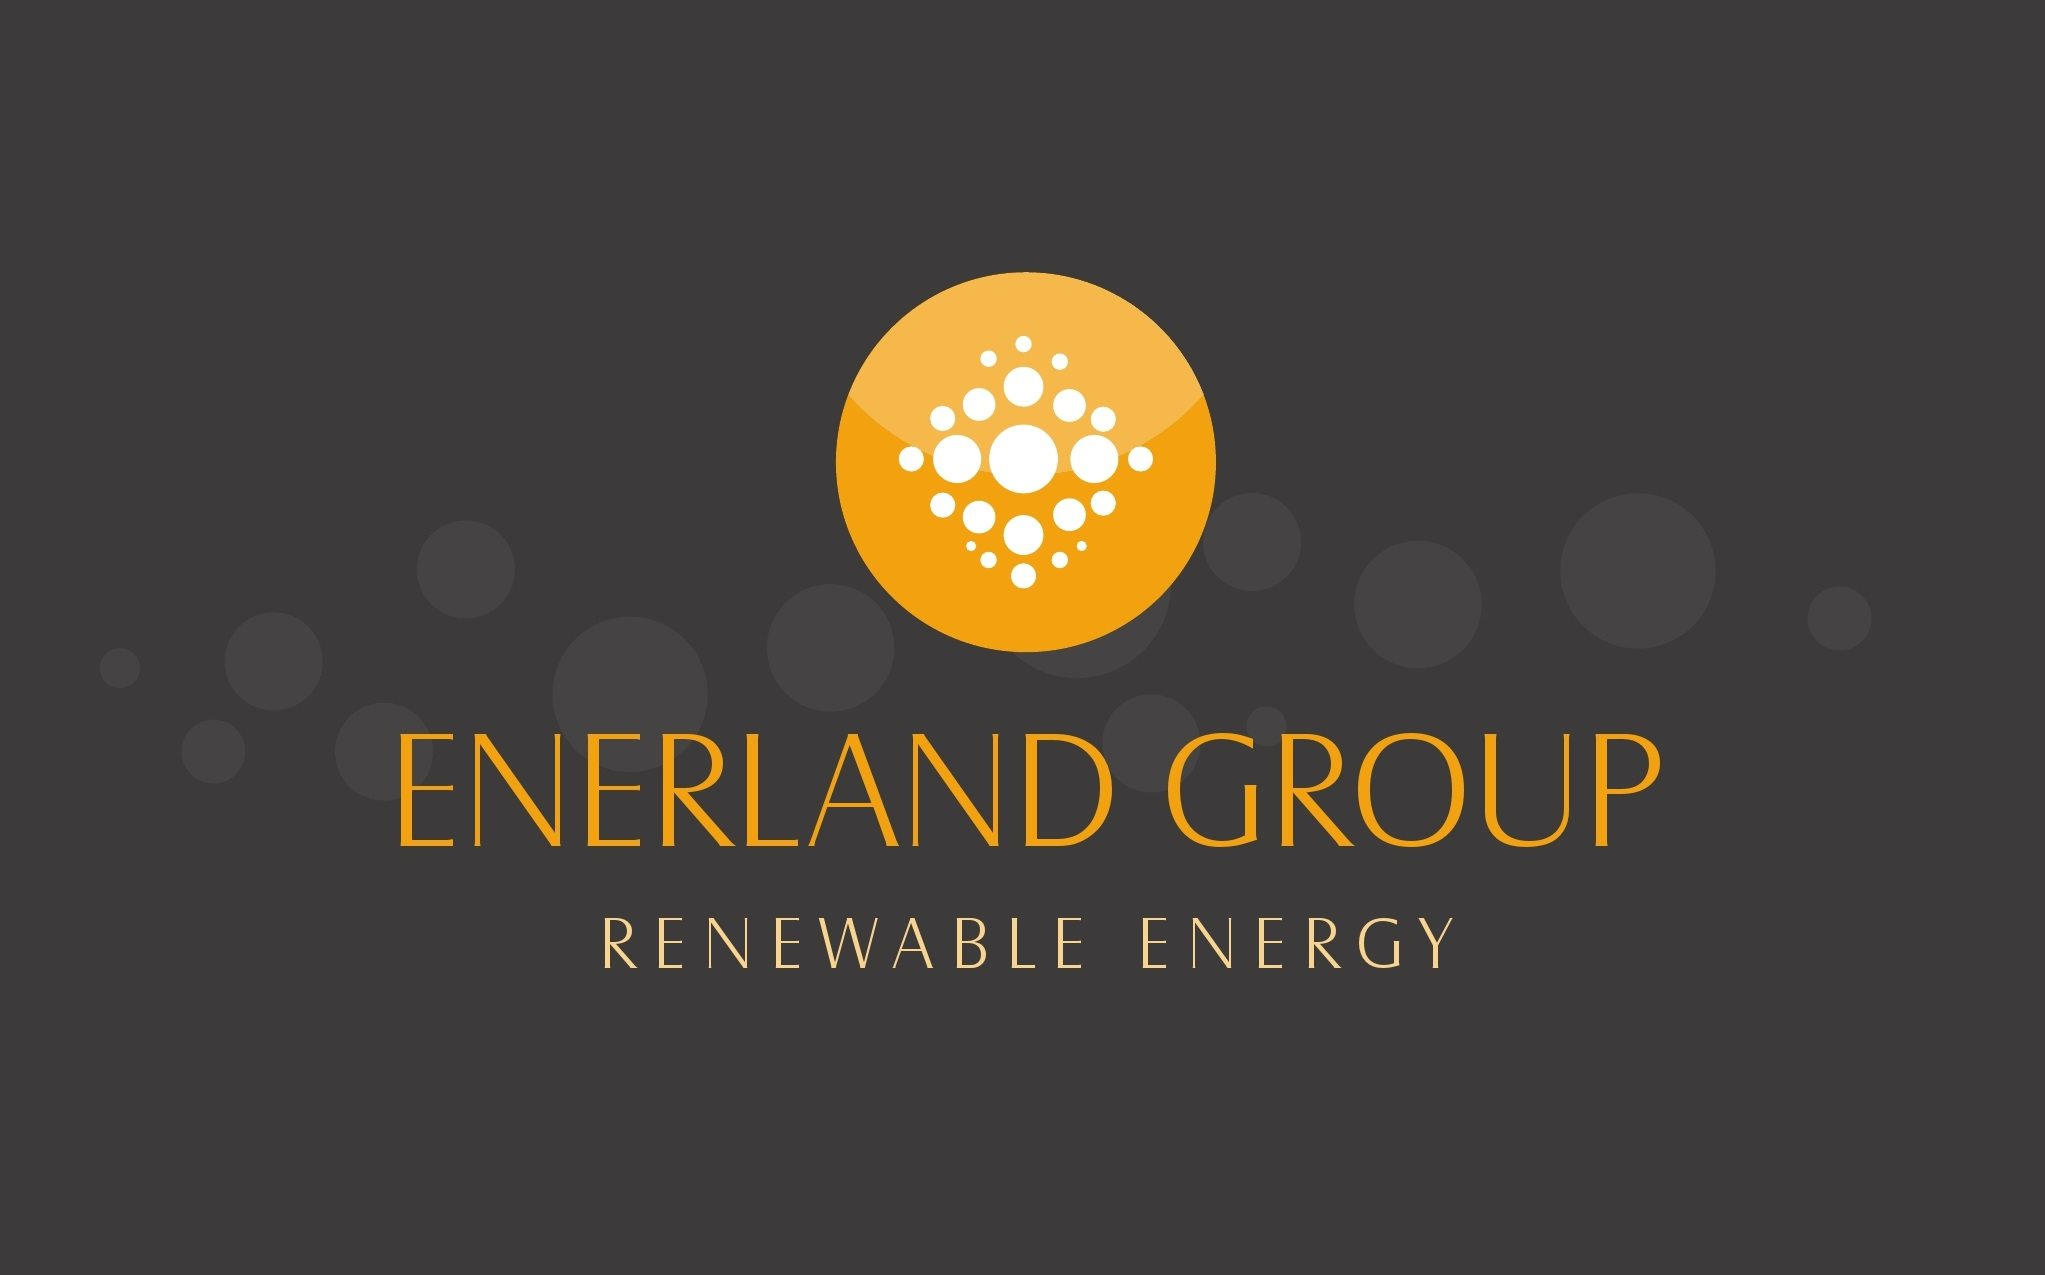 Enerland Group